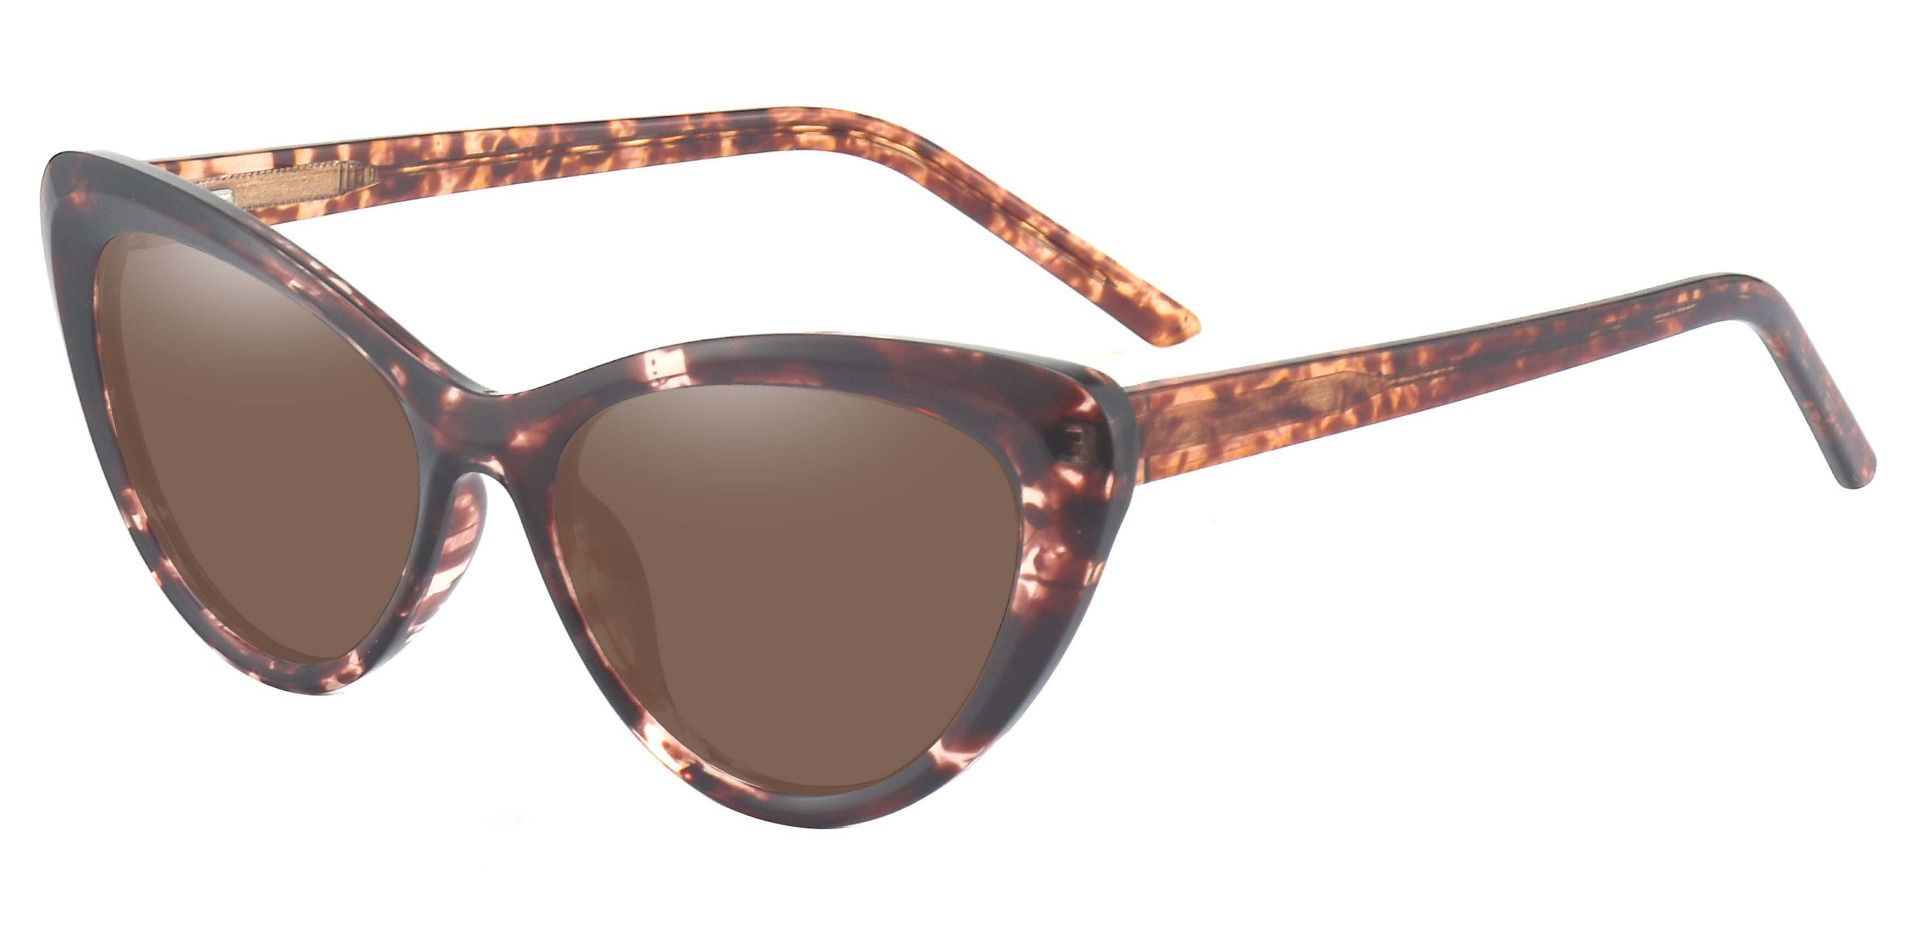 Gemini Cat Eye Non-Rx Sunglasses - Tortoise Frame With Brown Lenses